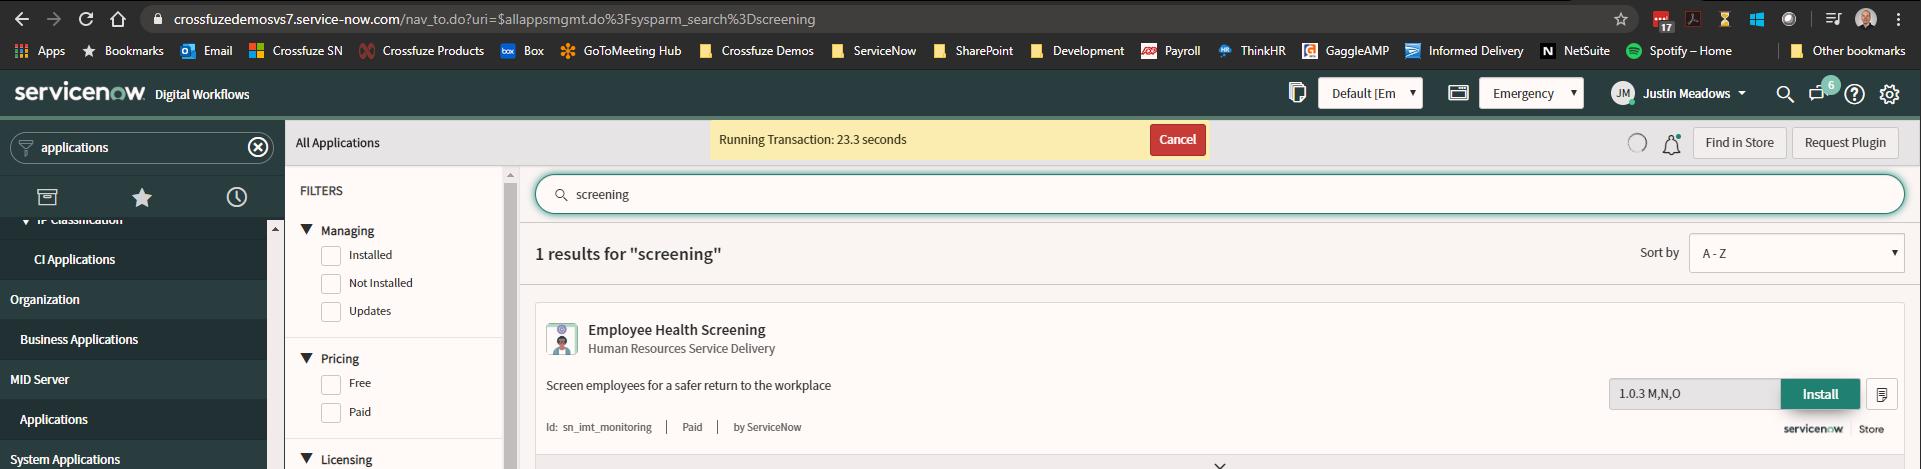 ServiceNow Safe Workplace App screenshot of Employee Health Screening portal